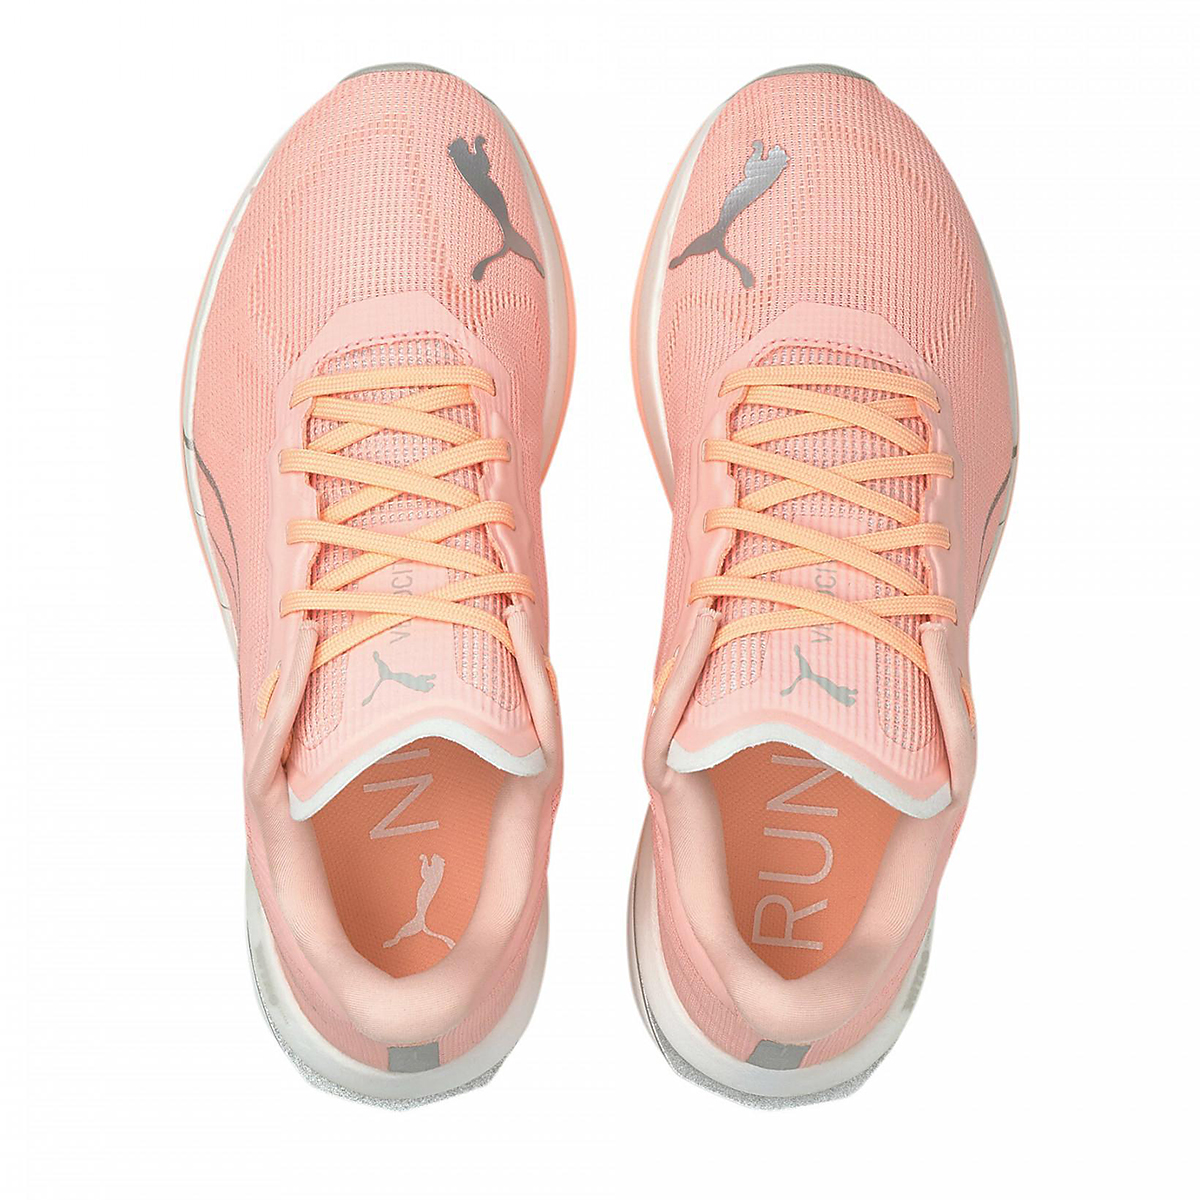 Women's Puma Velocity Nitro Running Shoe - Color: Elektro Peach-Puma Silver - Size: 5.5 - Width: Regular, Elektro Peach-Puma Silver, large, image 4